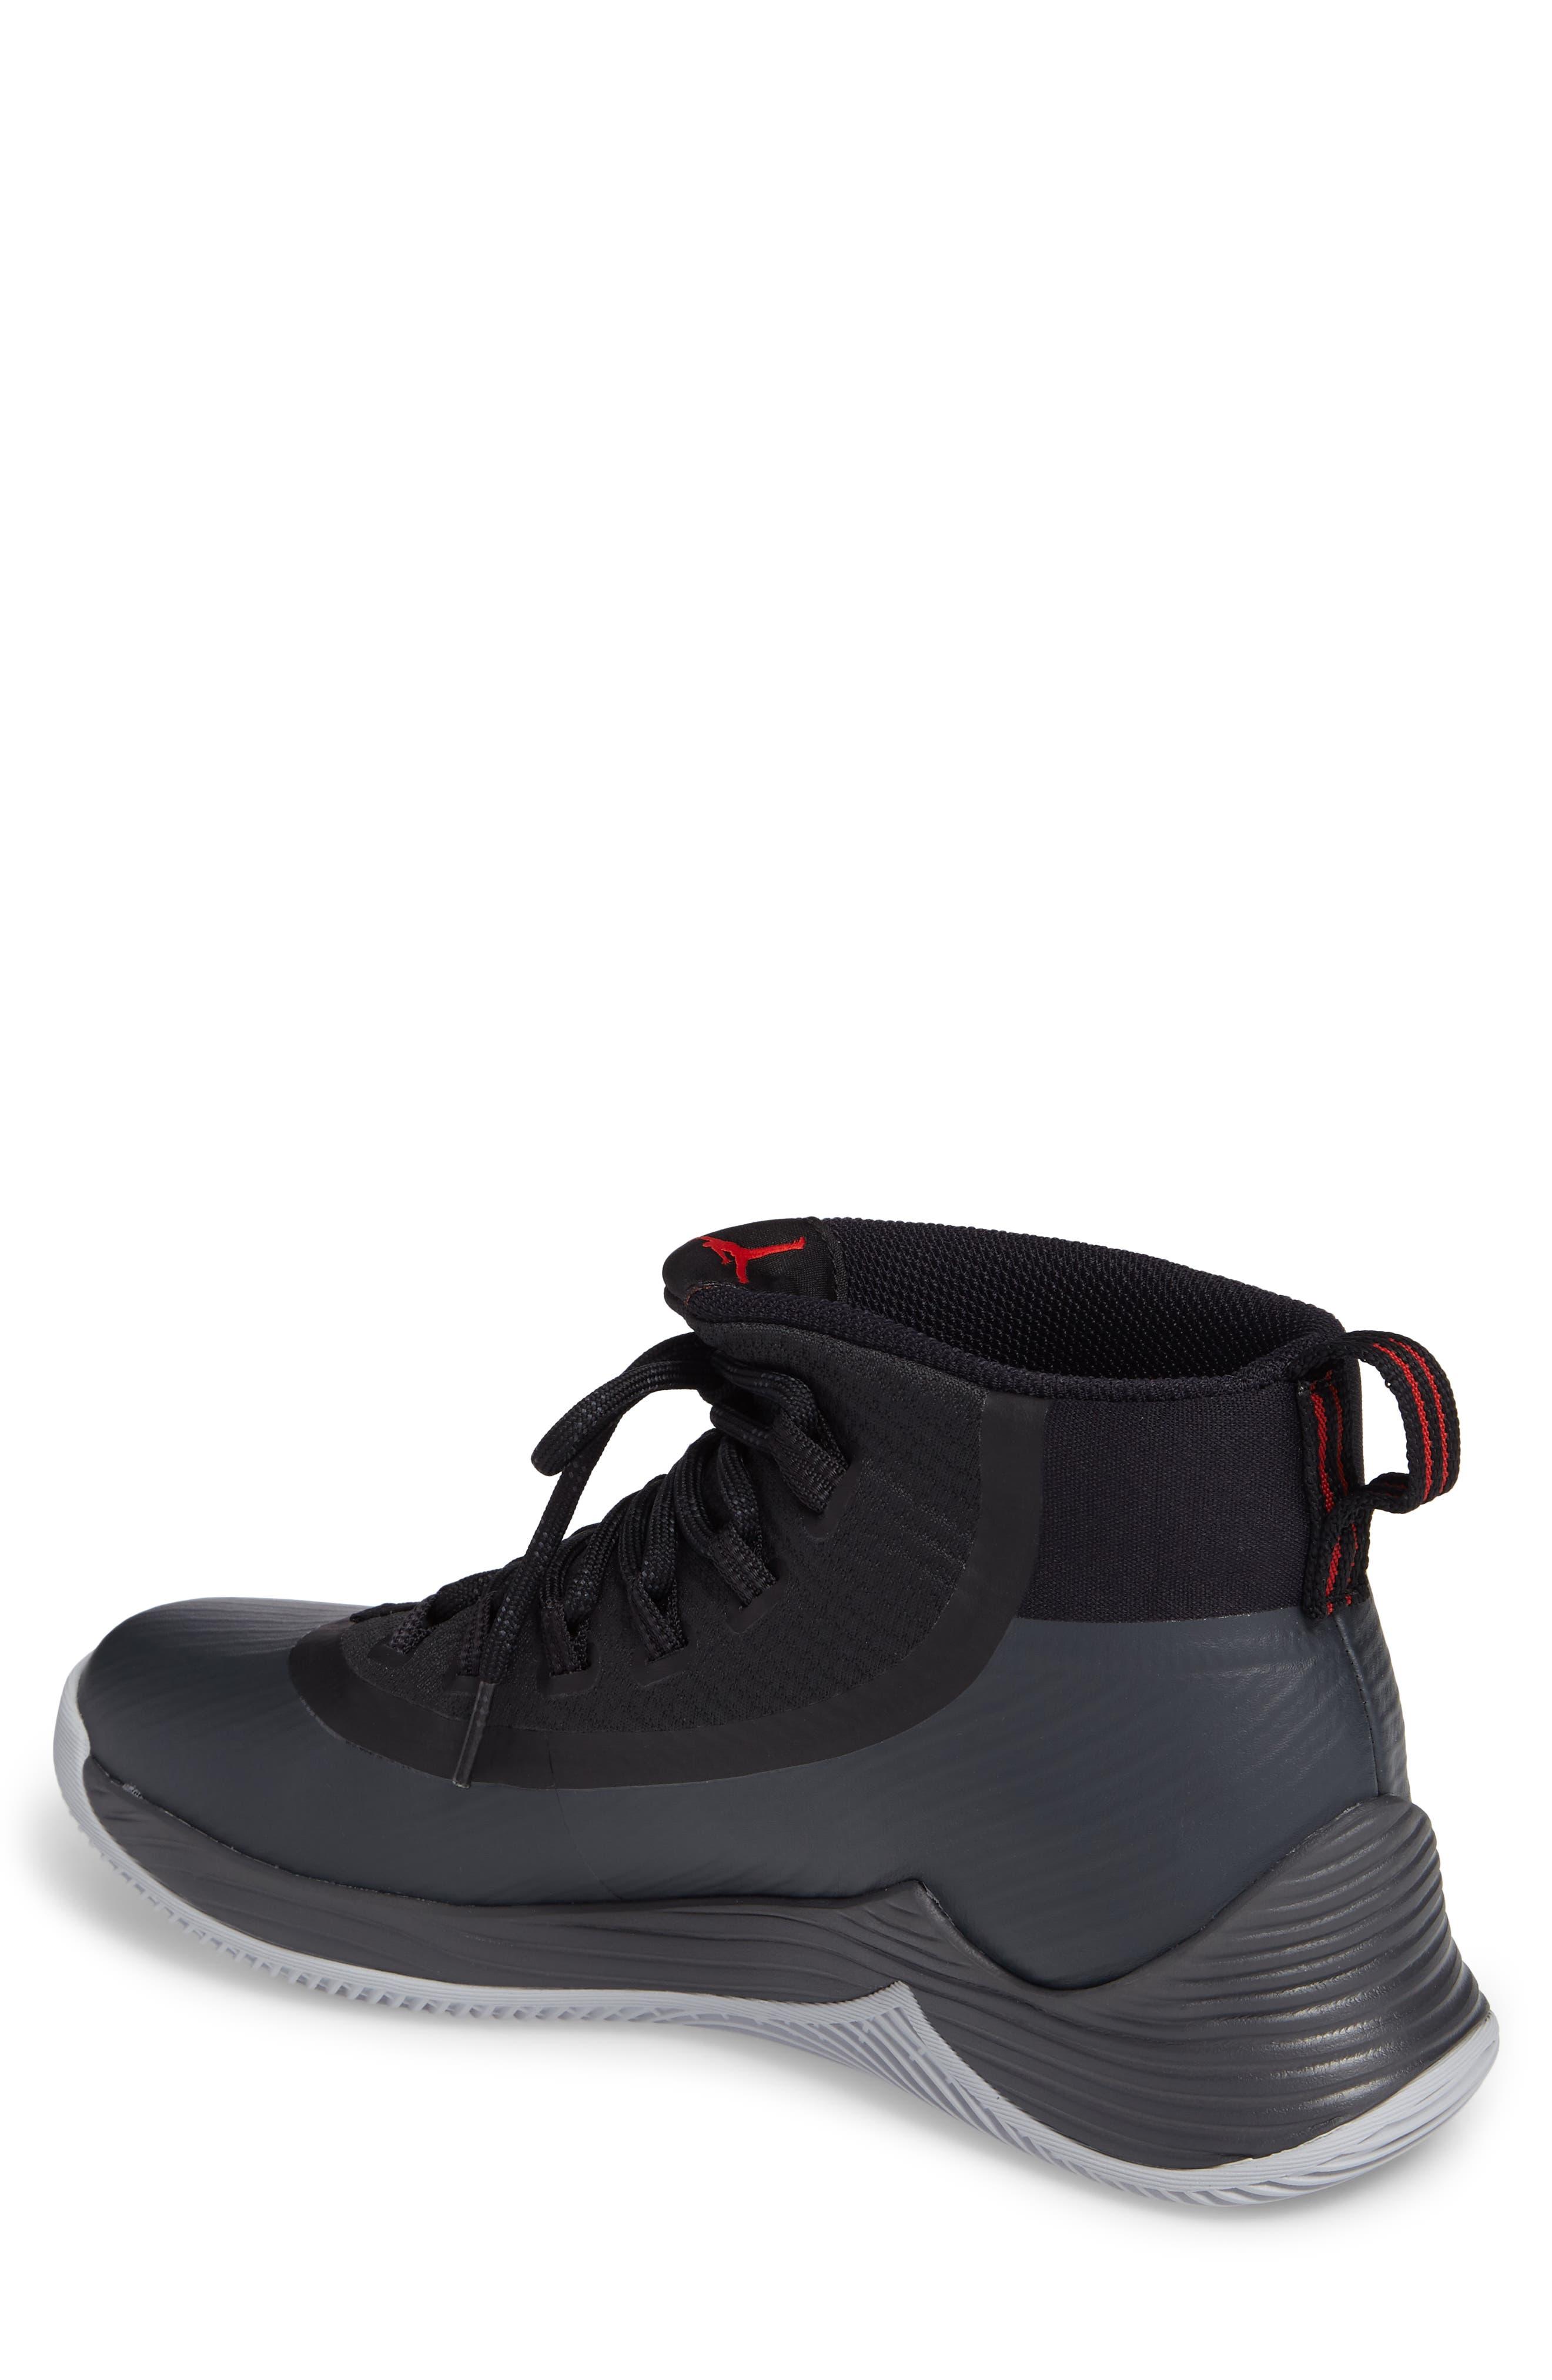 Jordan Ultra Fly 2 Basketball Shoe,                             Alternate thumbnail 2, color,                             002